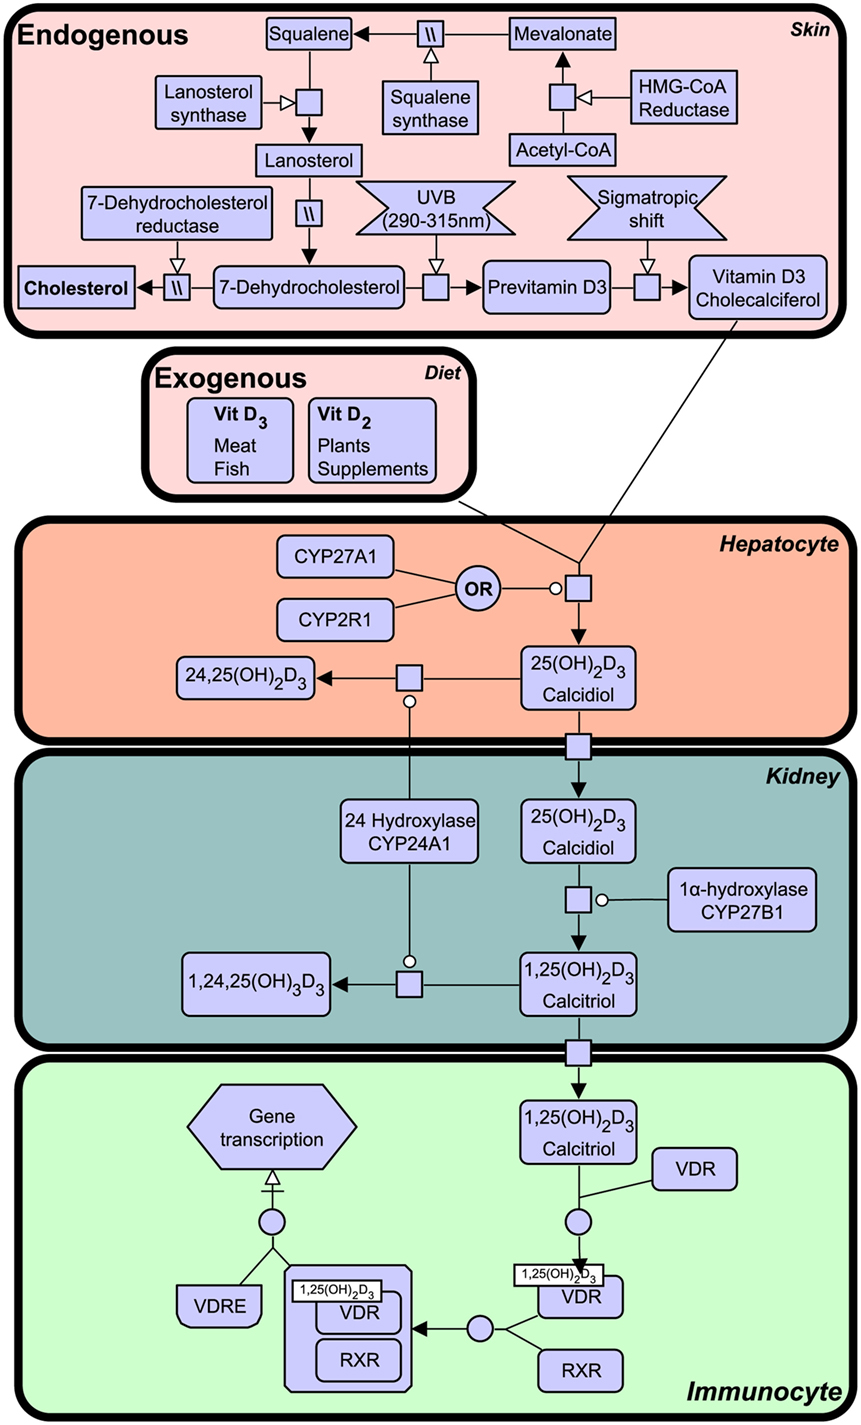 Frontiers | Evolutionary Origin of the Interferon–Immune Metabolic on johnson 55 hp wiring diagram, johnson 25 hp wiring diagram, johnson 40 hp wiring diagram, johnson 50 hp wiring diagram, johnson 90 hp wiring diagram, johnson 60 hp wiring diagram, johnson 15 hp wiring diagram, johnson 75 hp wiring diagram, johnson 28 hp wiring diagram, johnson 20 hp wiring diagram, johnson 70 hp wiring diagram, johnson 100 hp wiring diagram, johnson 115 hp wiring diagram,